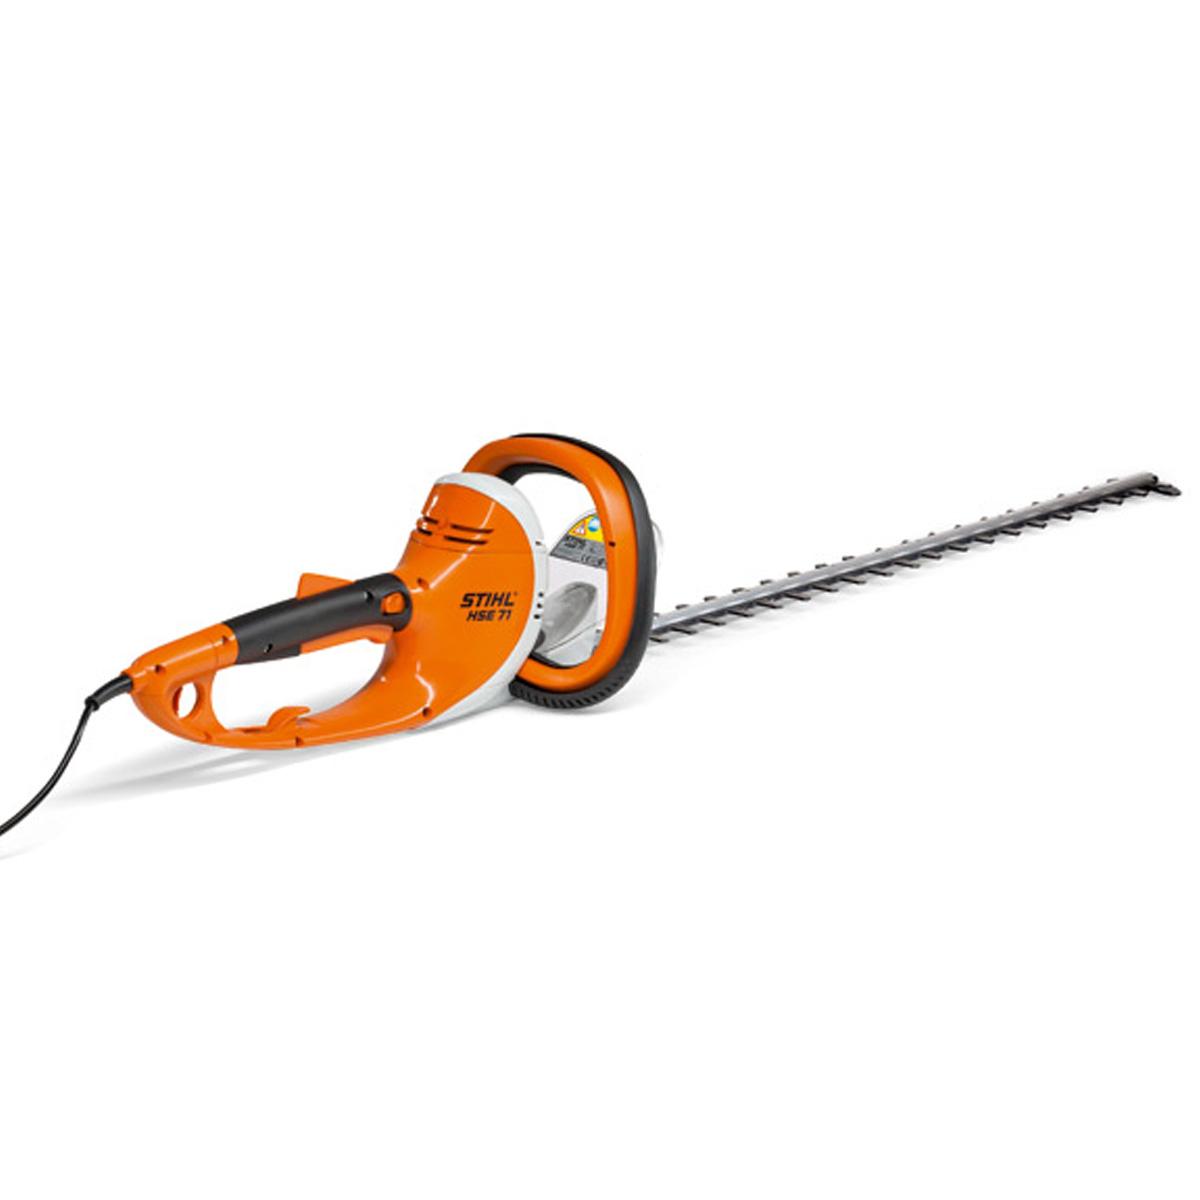 Stihl hse 71 electric hedge trimmer australian mower supply - Stihl hse 71 ...